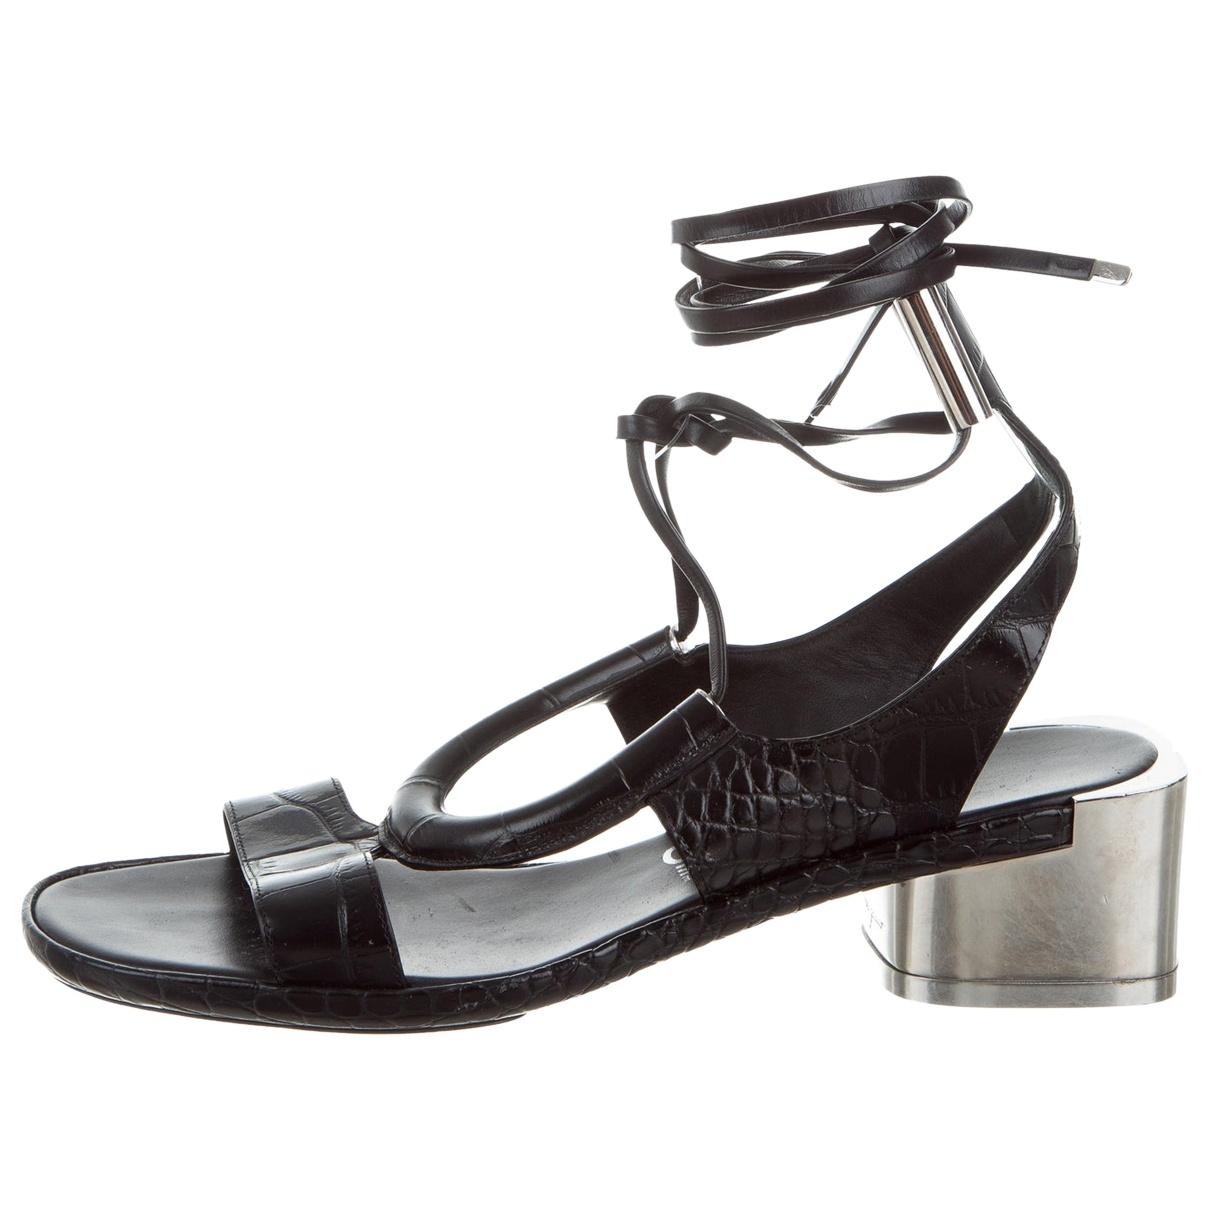 Salvatore Ferragamo \N Black Leather Sandals for Women 7 US